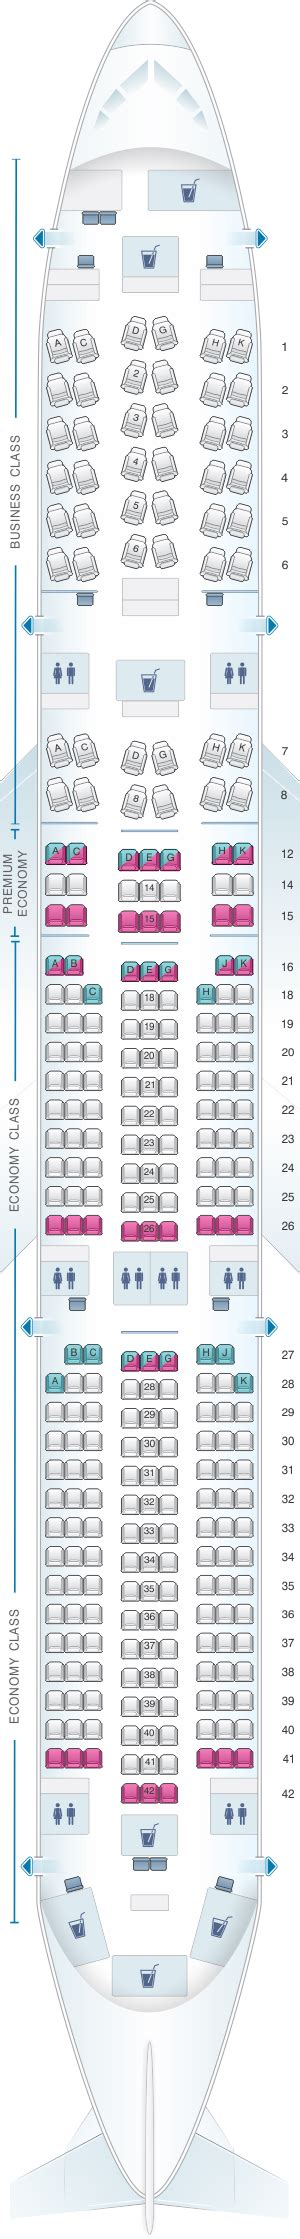 lufthansa airbus a380 seat map lufthansa a380 800 business class seat map